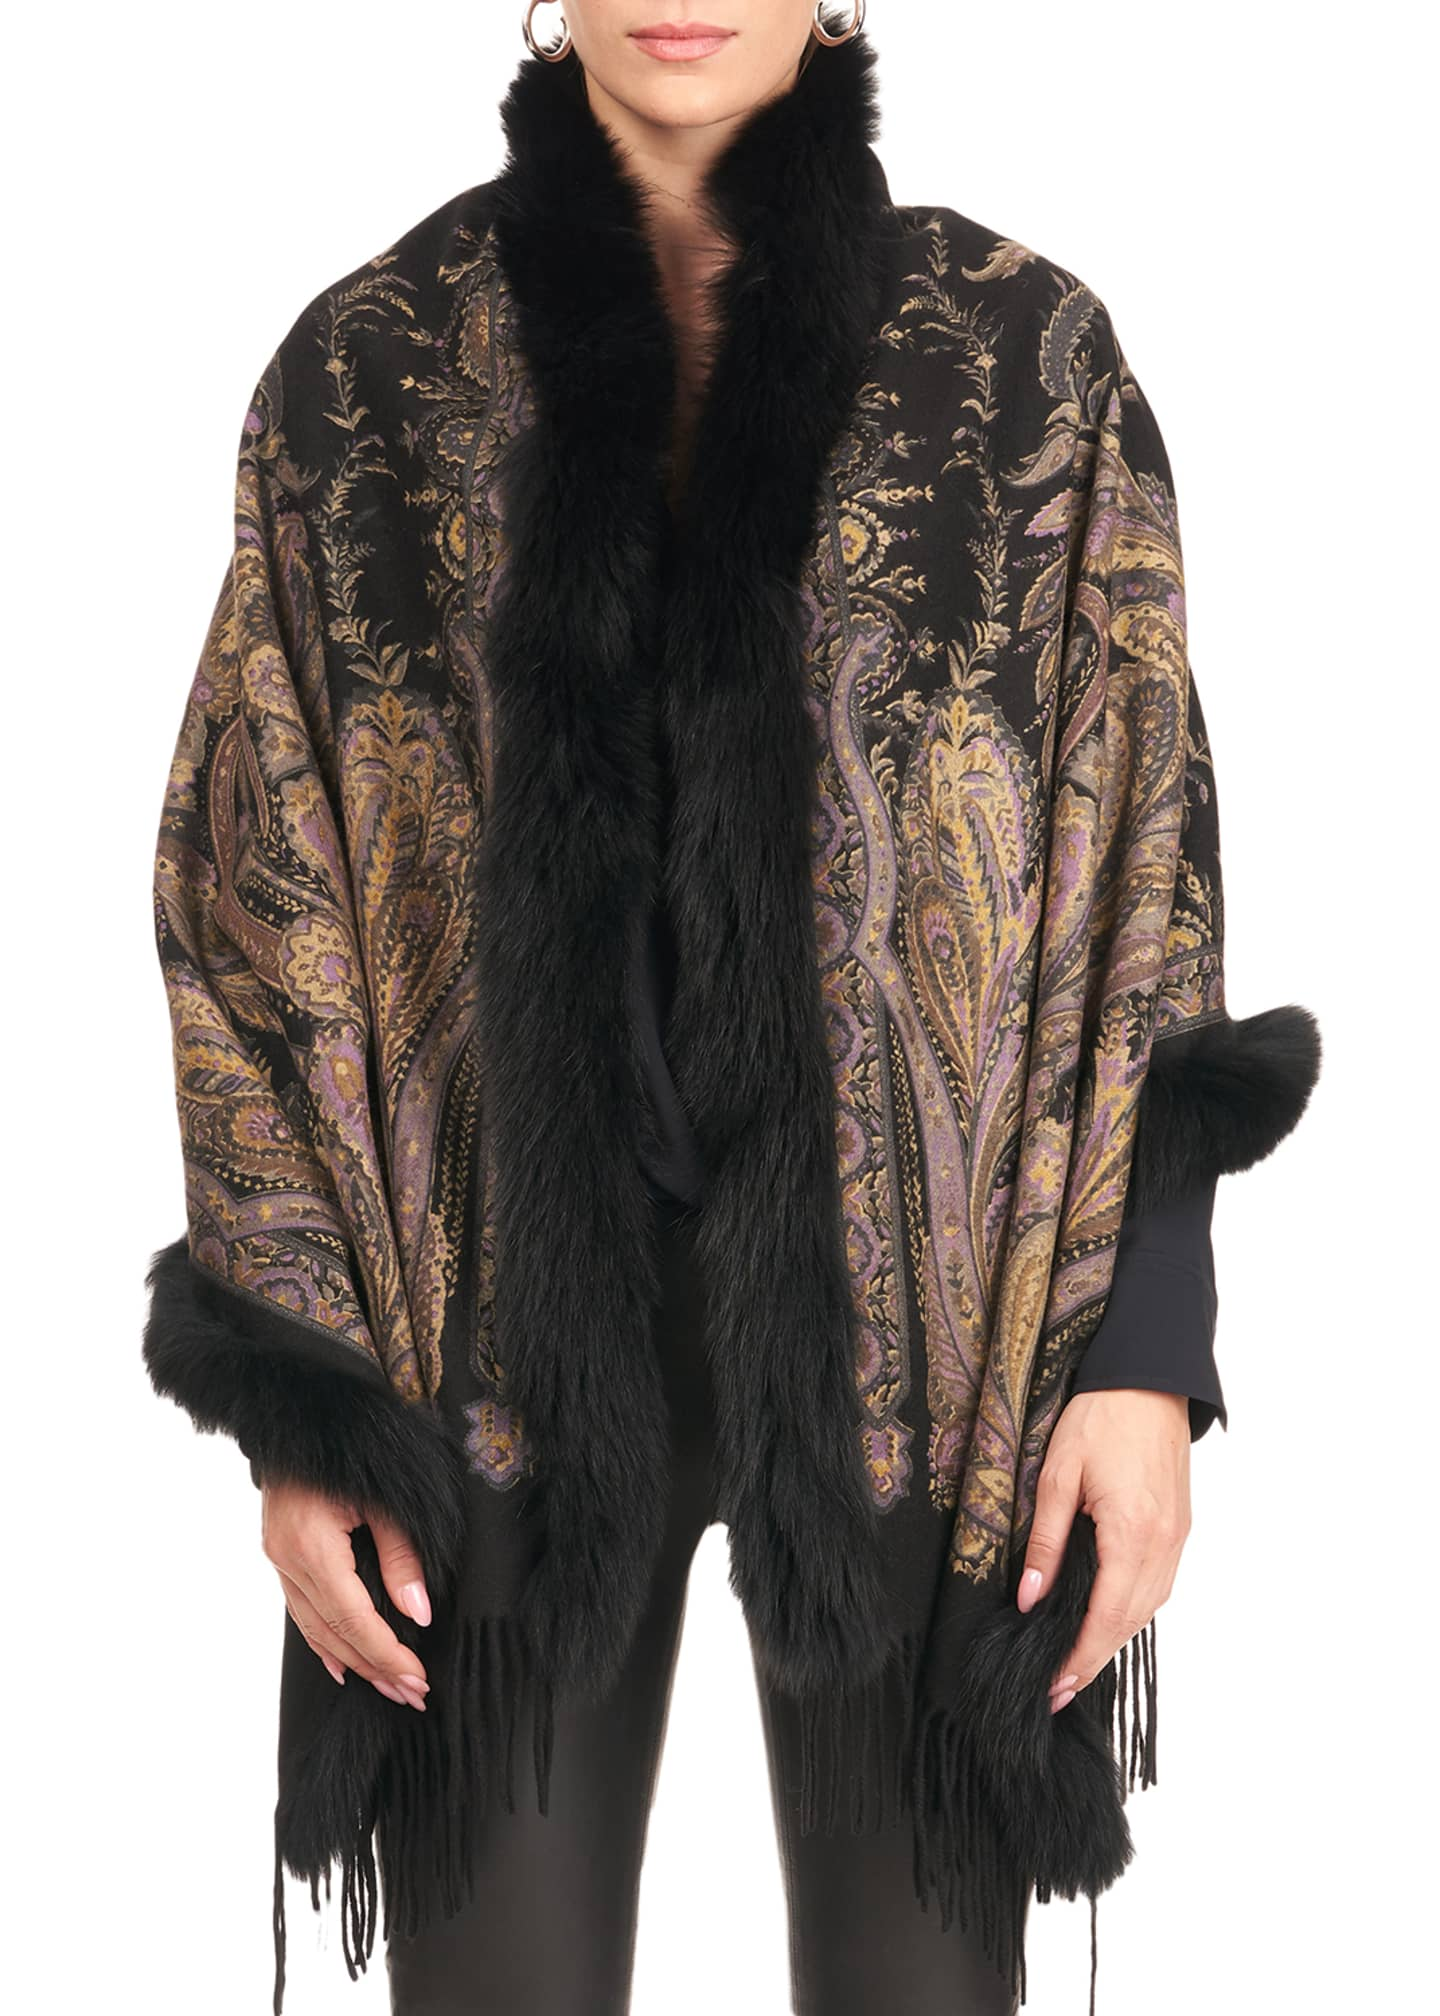 Gorski Paisley Print Cashmere Stole w/ Fox Fur